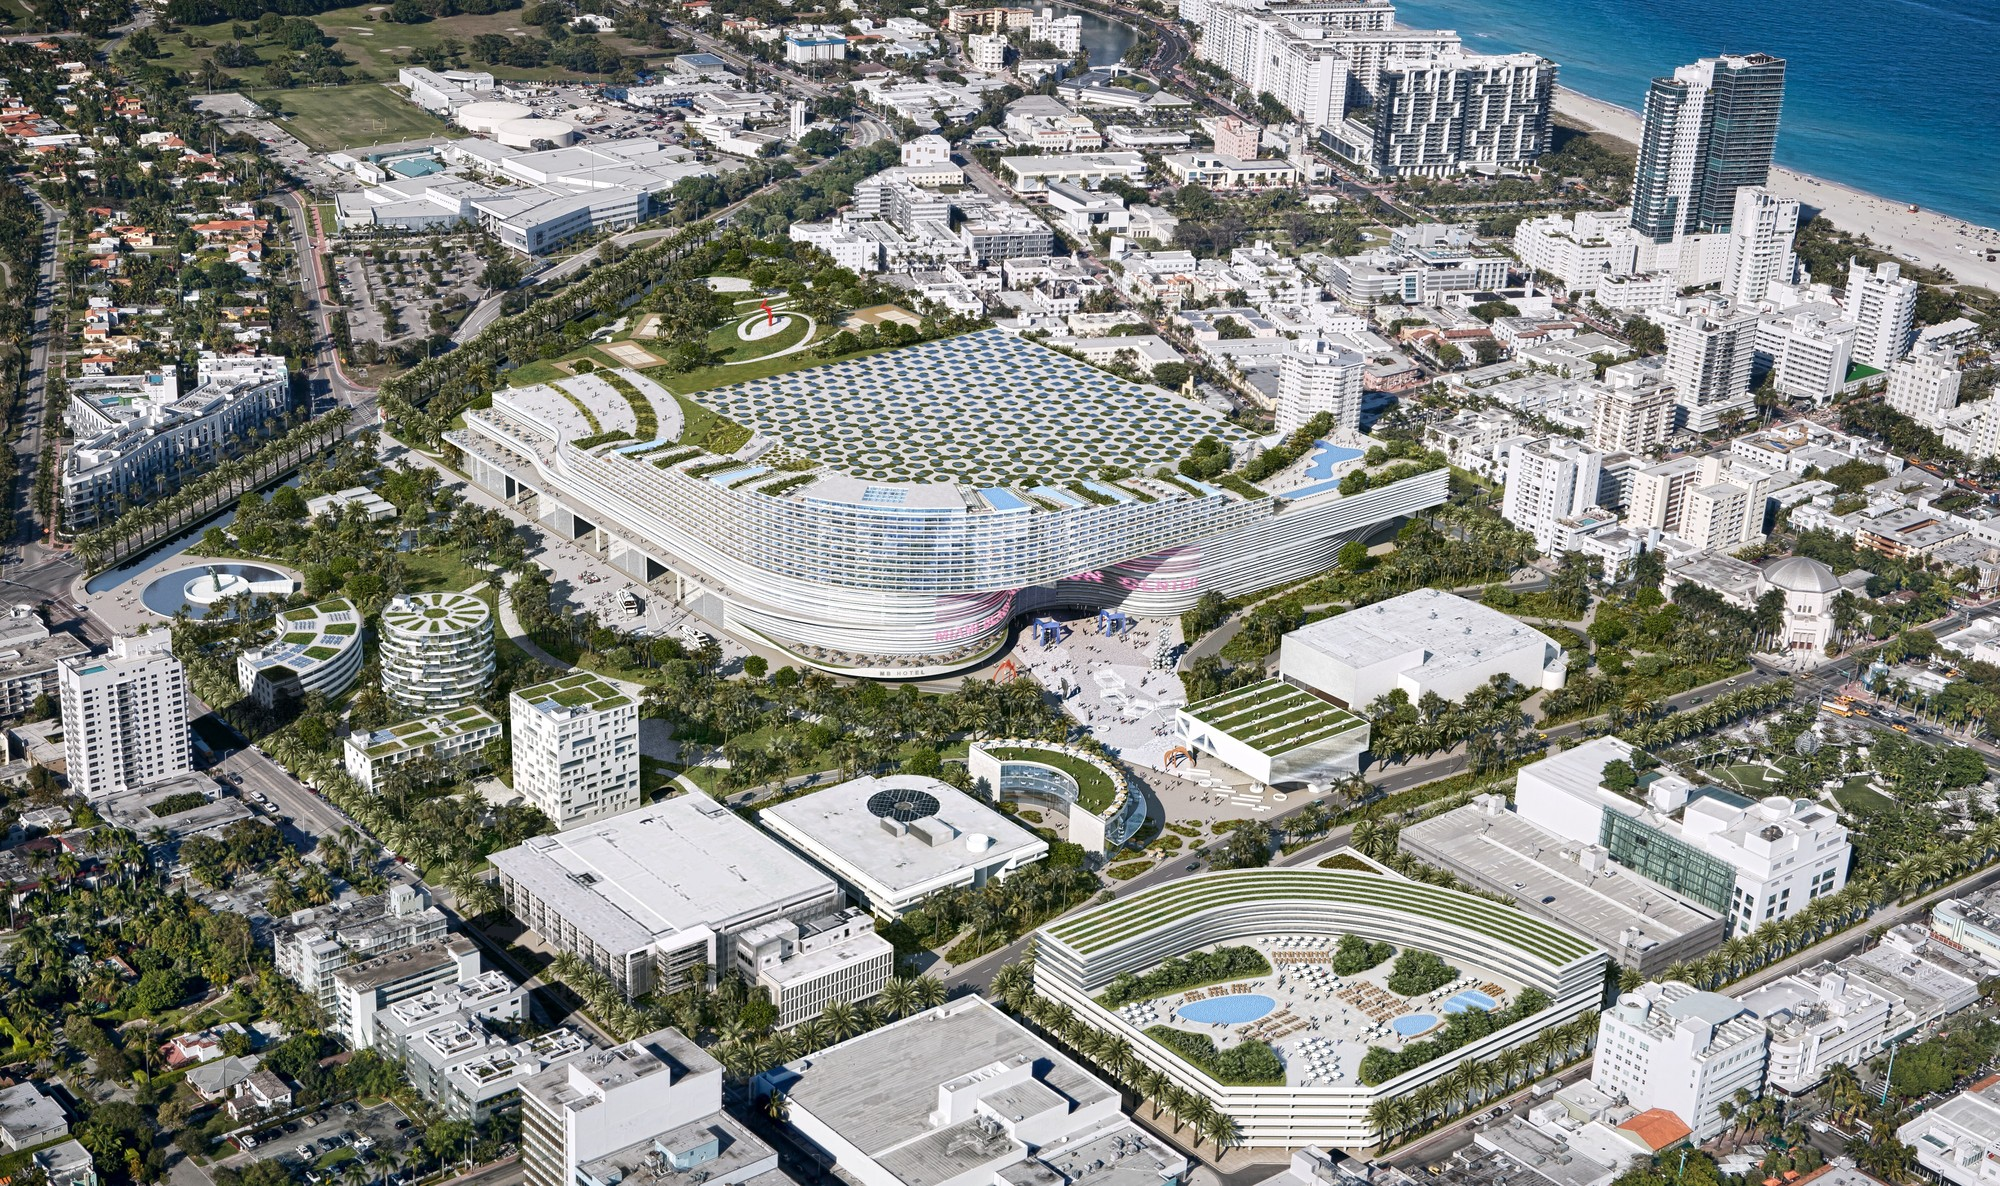 Oma proposes radical redevelopment plan for the miami - Home design miami beach convention center ...